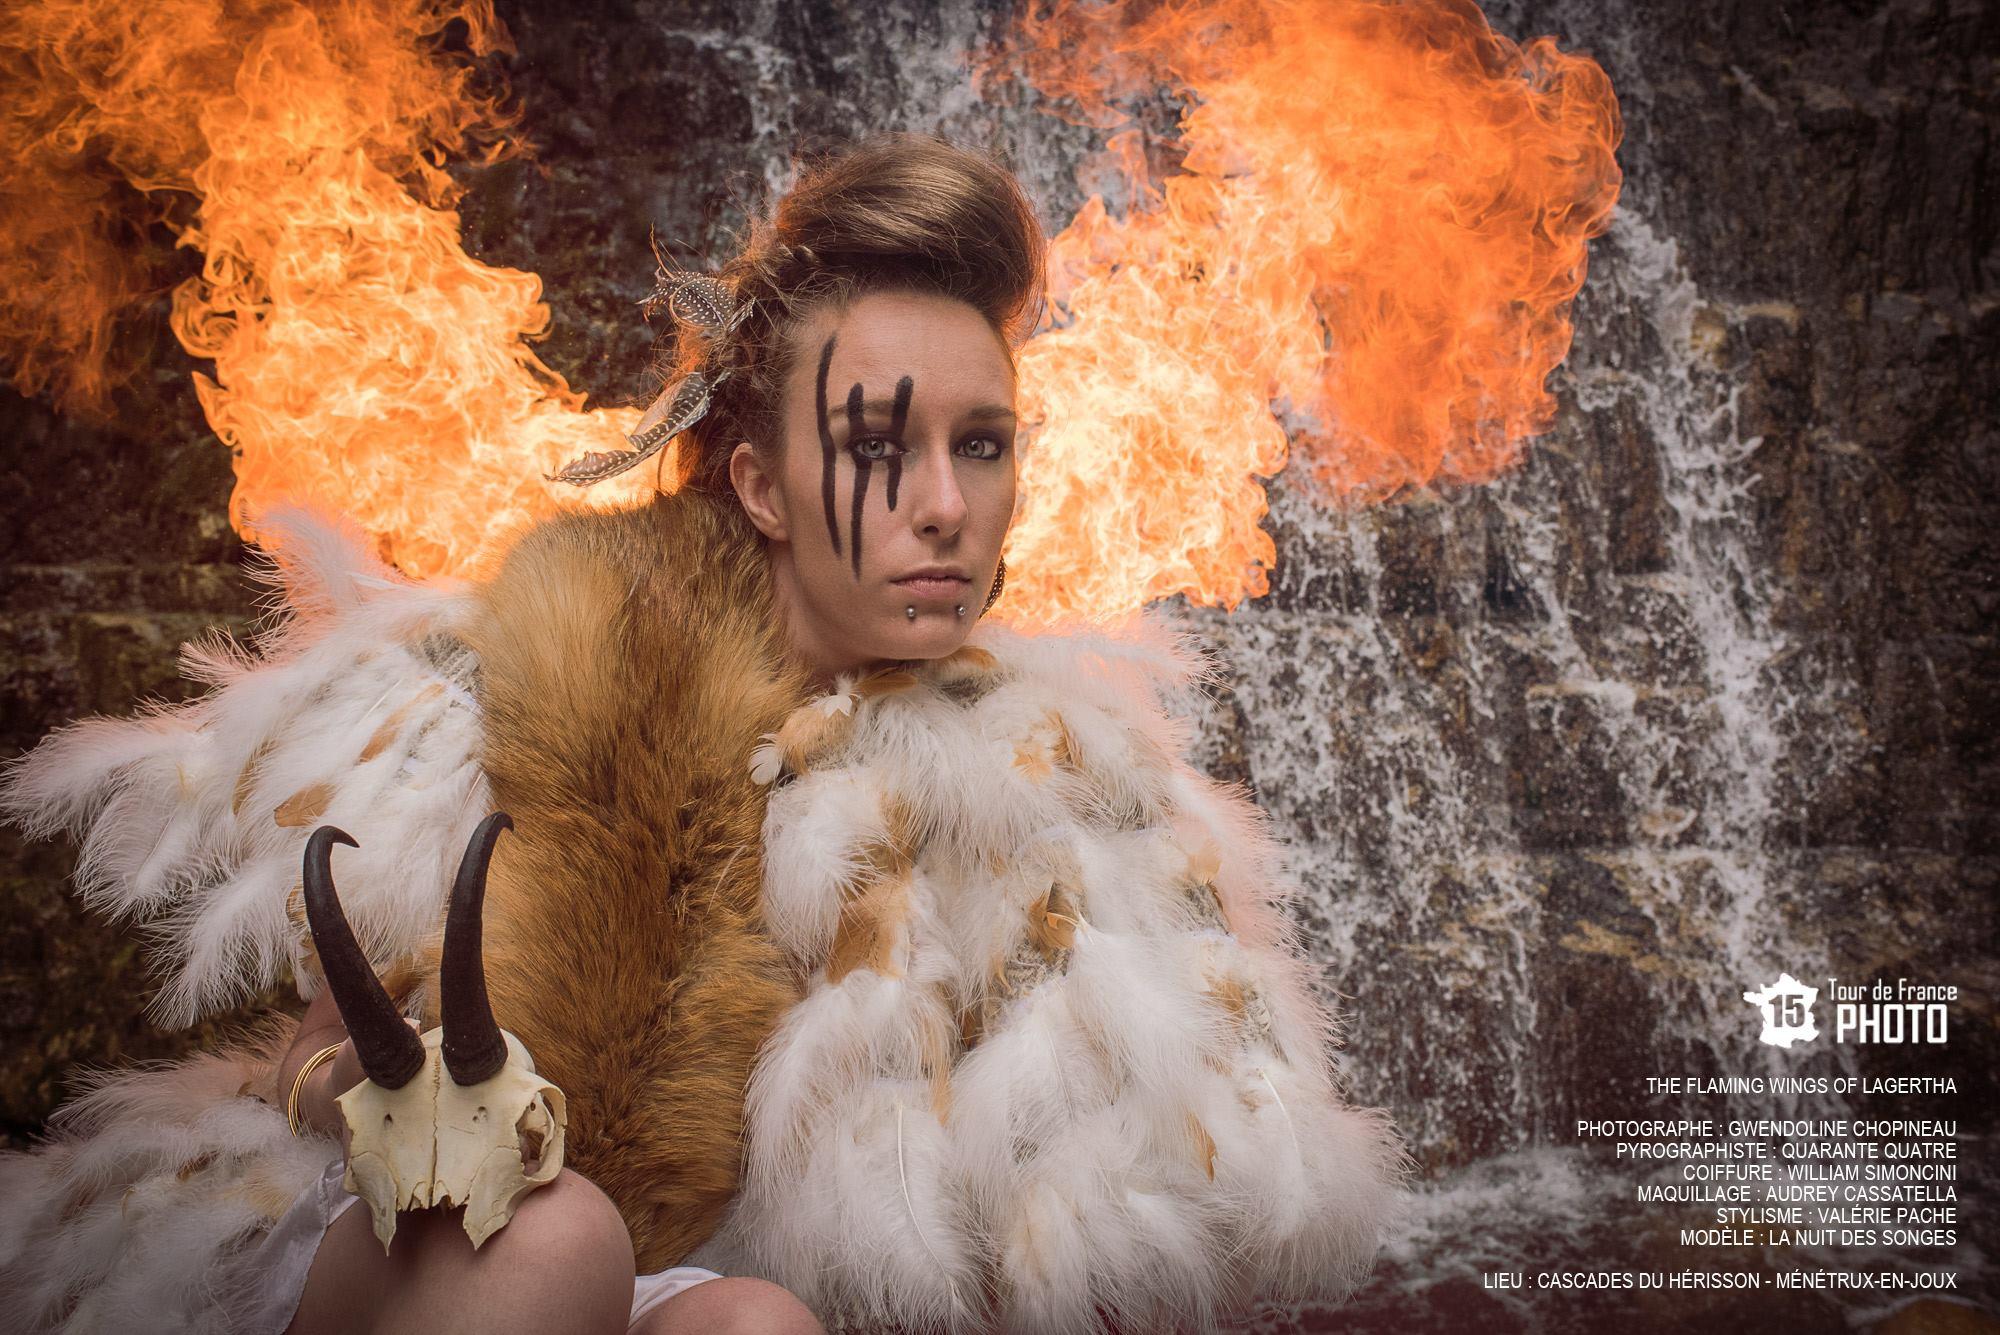 Ailes enflammées Lagertha